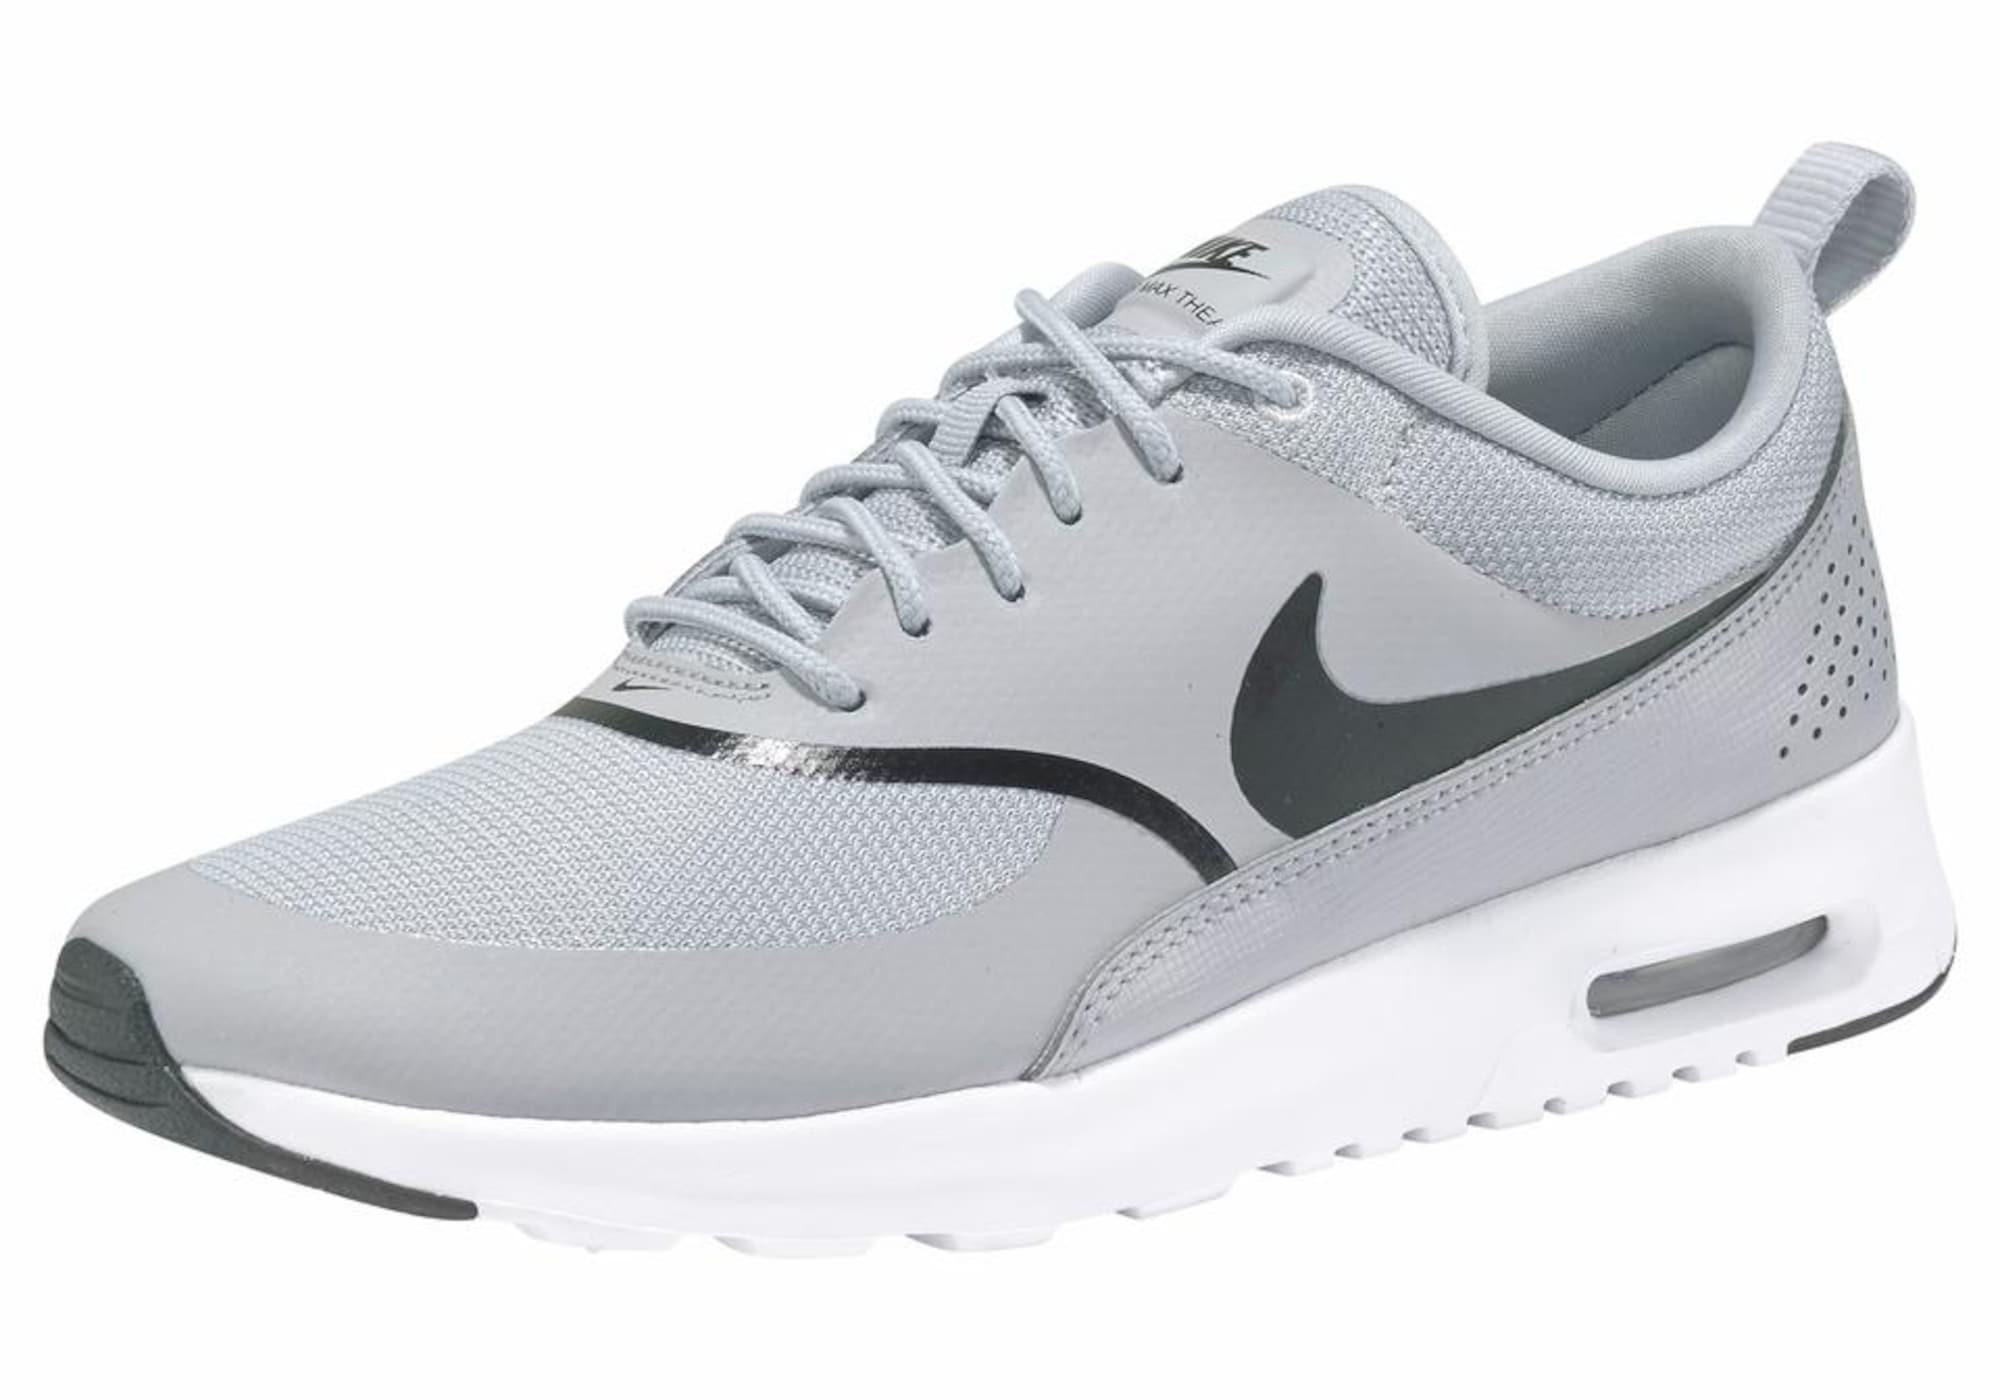 Tenisky AIR MAX THEA světle šedá černá Nike Sportswear